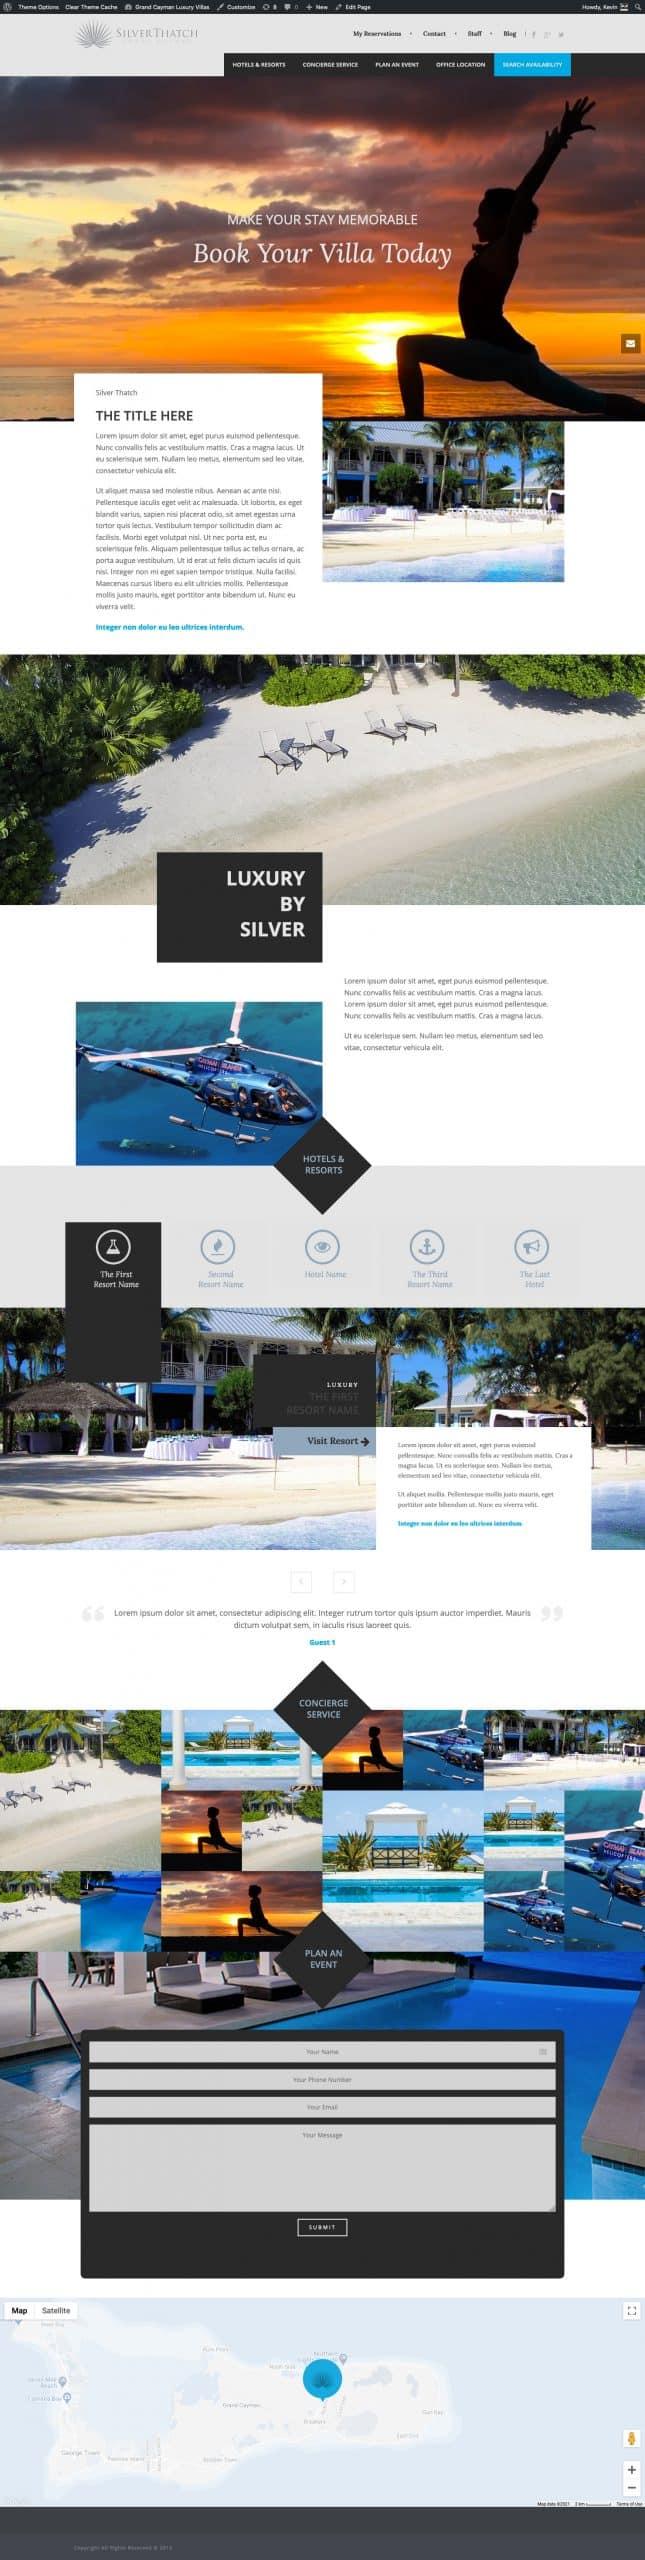 Screenshot_2021-01-12-Grand-Cayman-Luxury-Villas